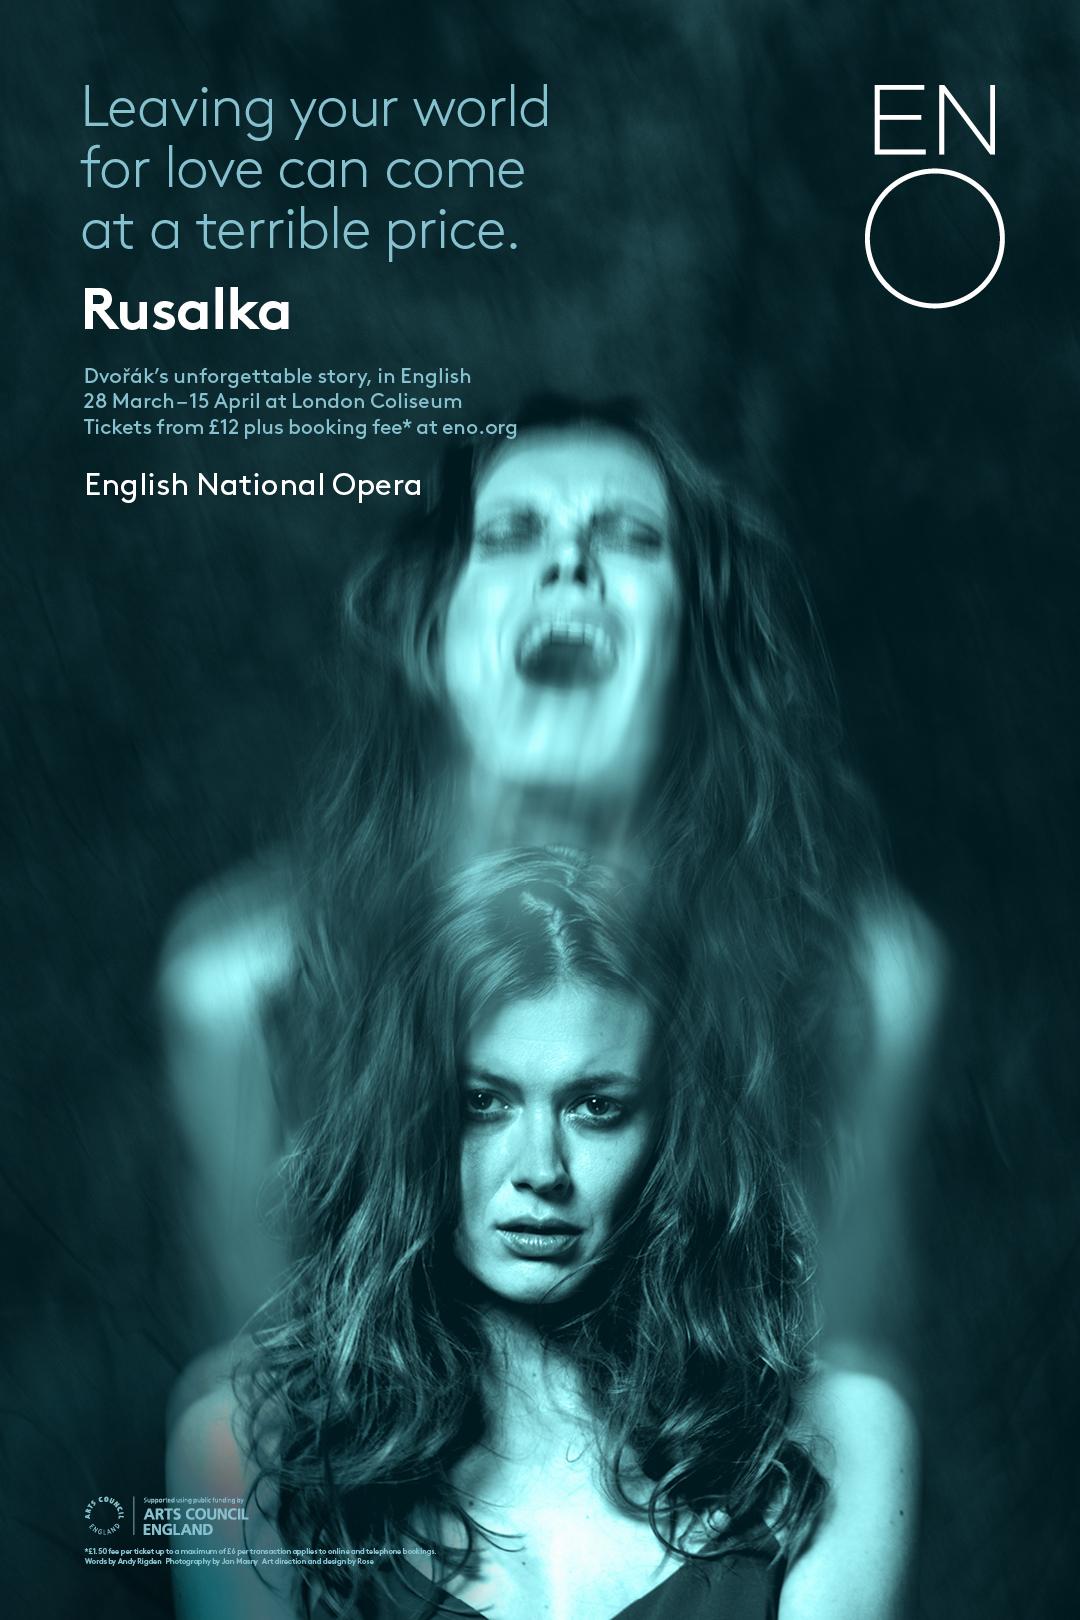 ENO Rusalka